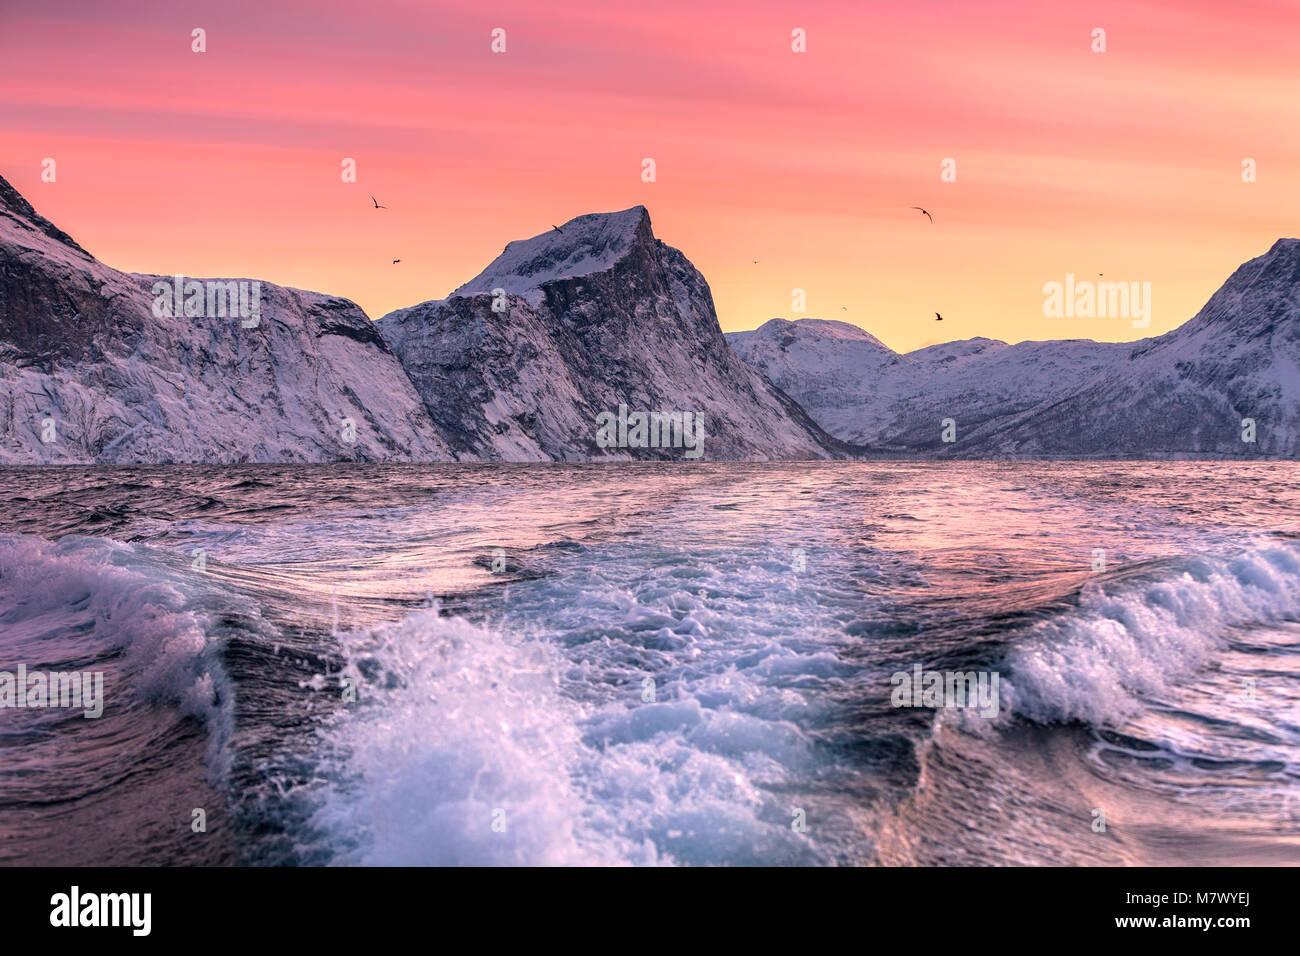 Norwegian's fjord, Mefjorvaer village, Senja island, Norway - Stock Image